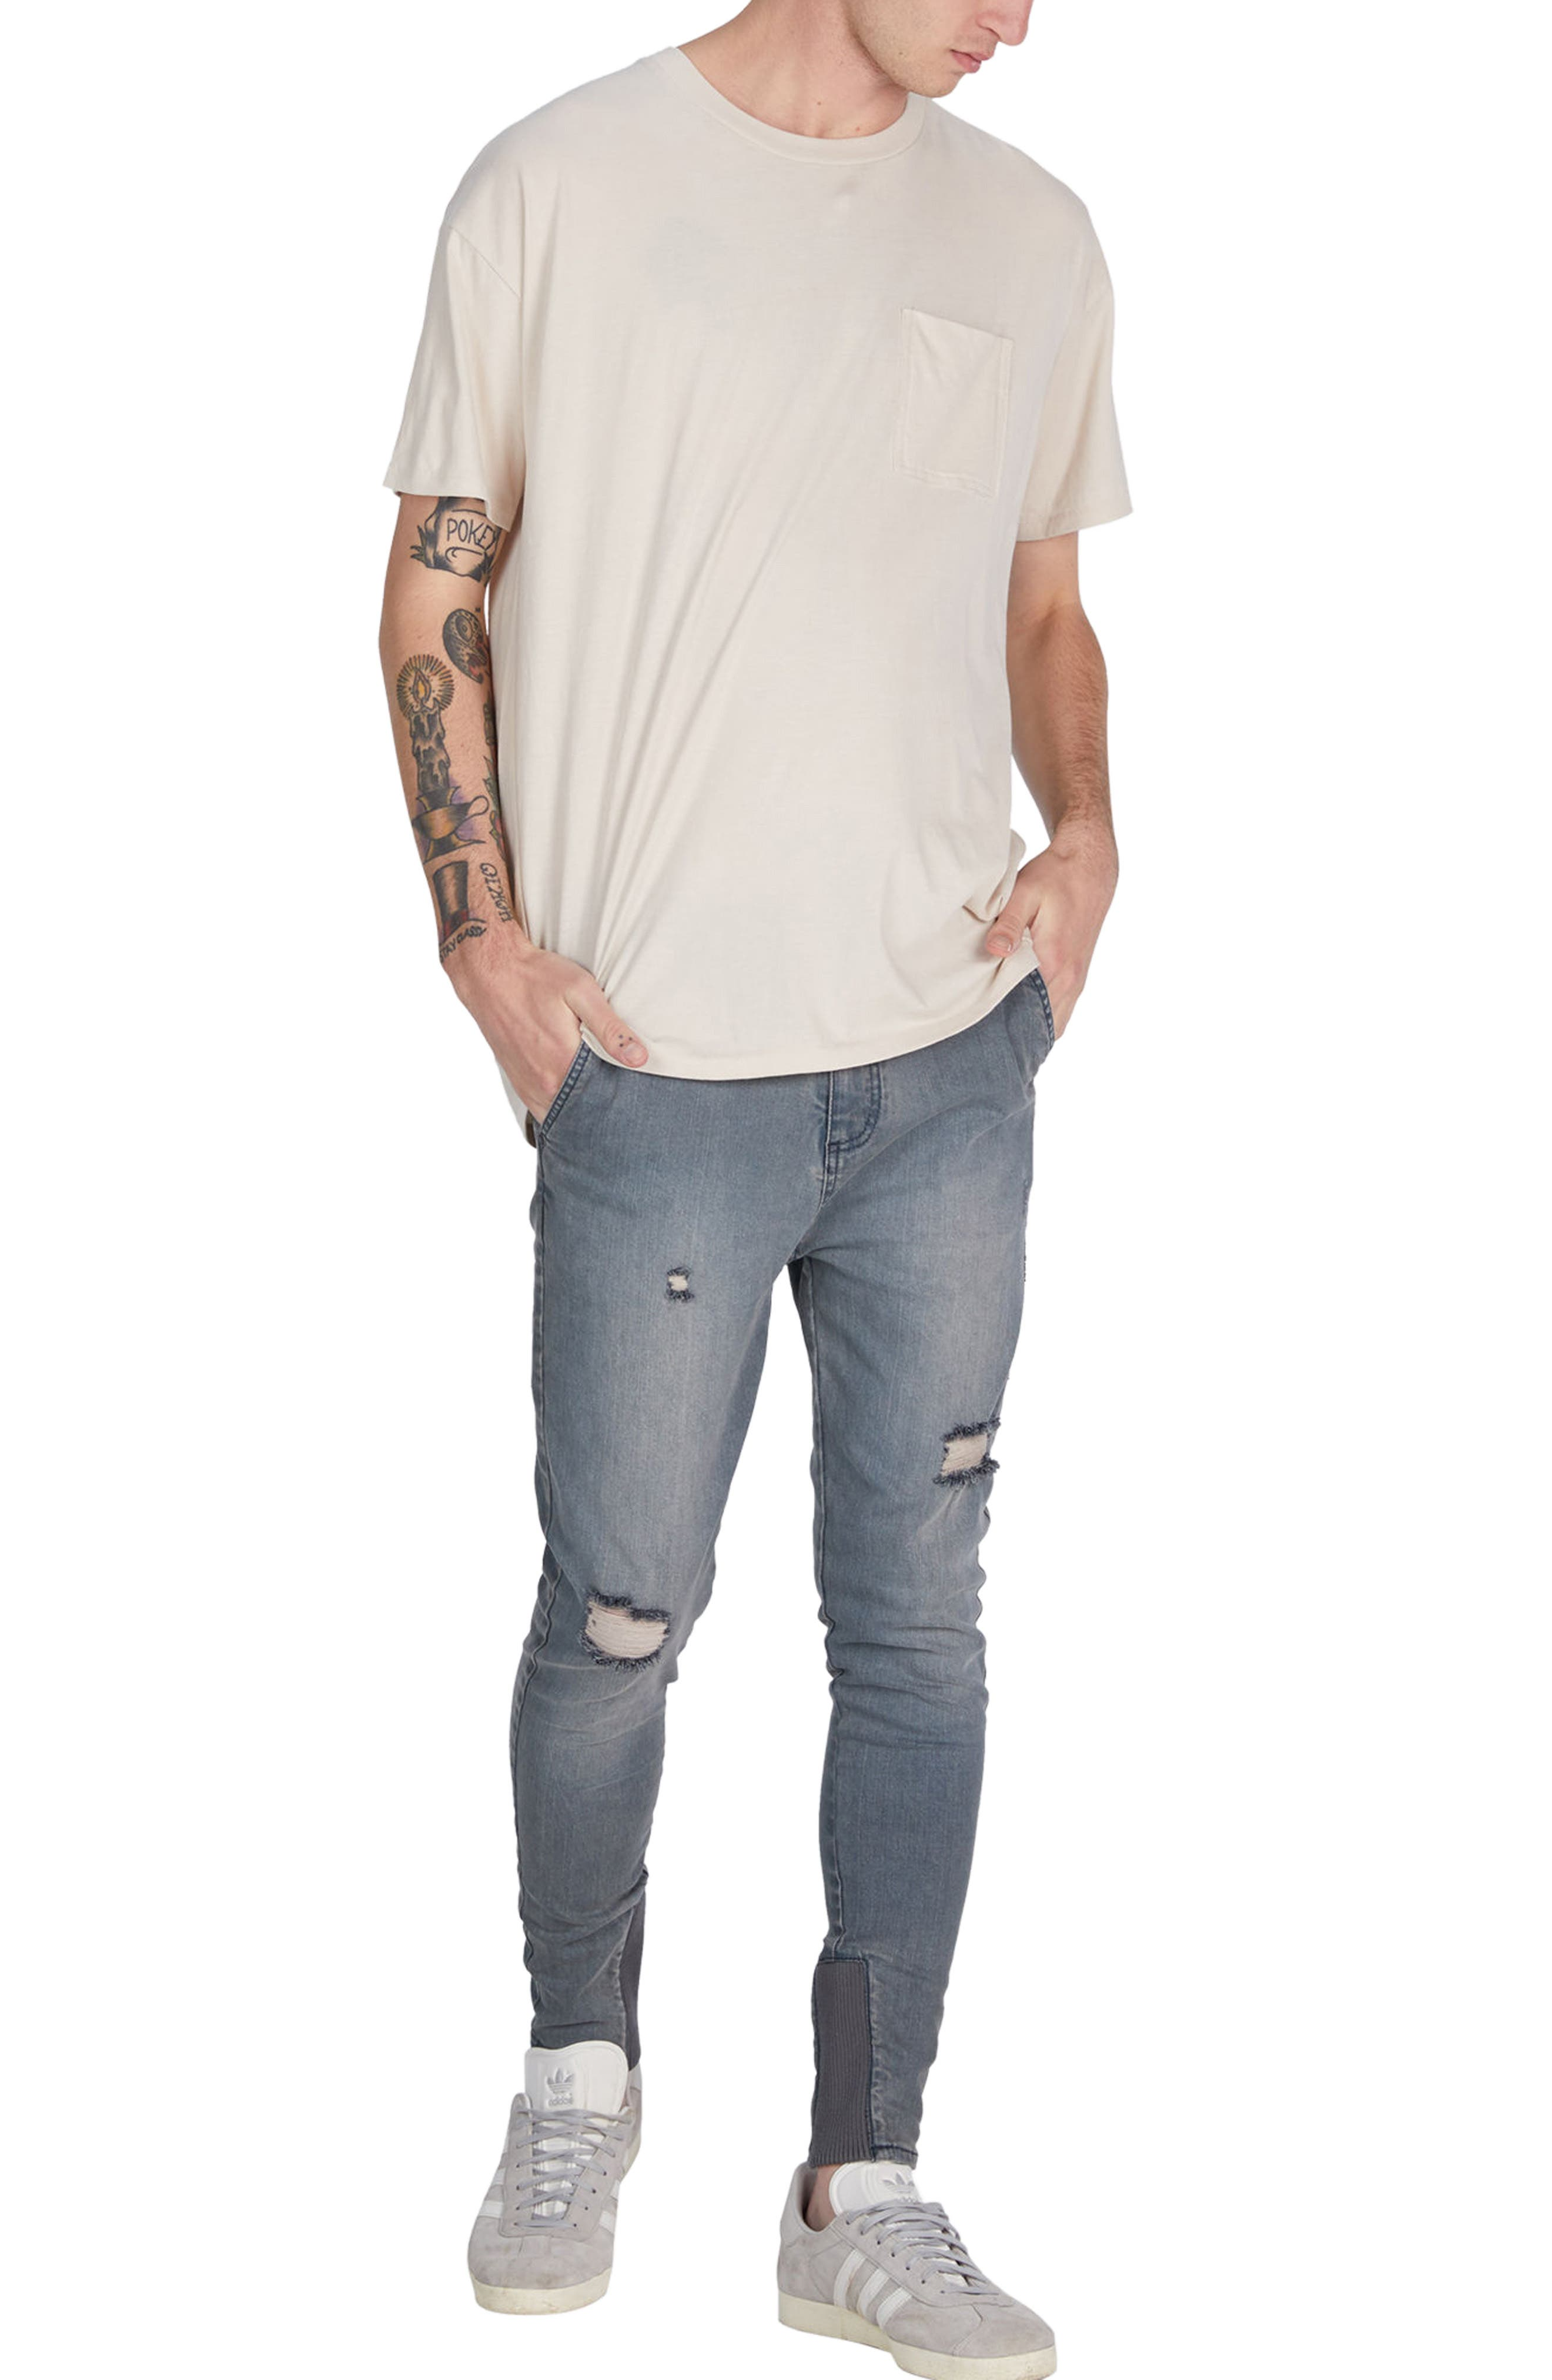 Sharpshot Slouchy Skinny Fit Denim Pants,                             Alternate thumbnail 5, color,                             Blue Grey